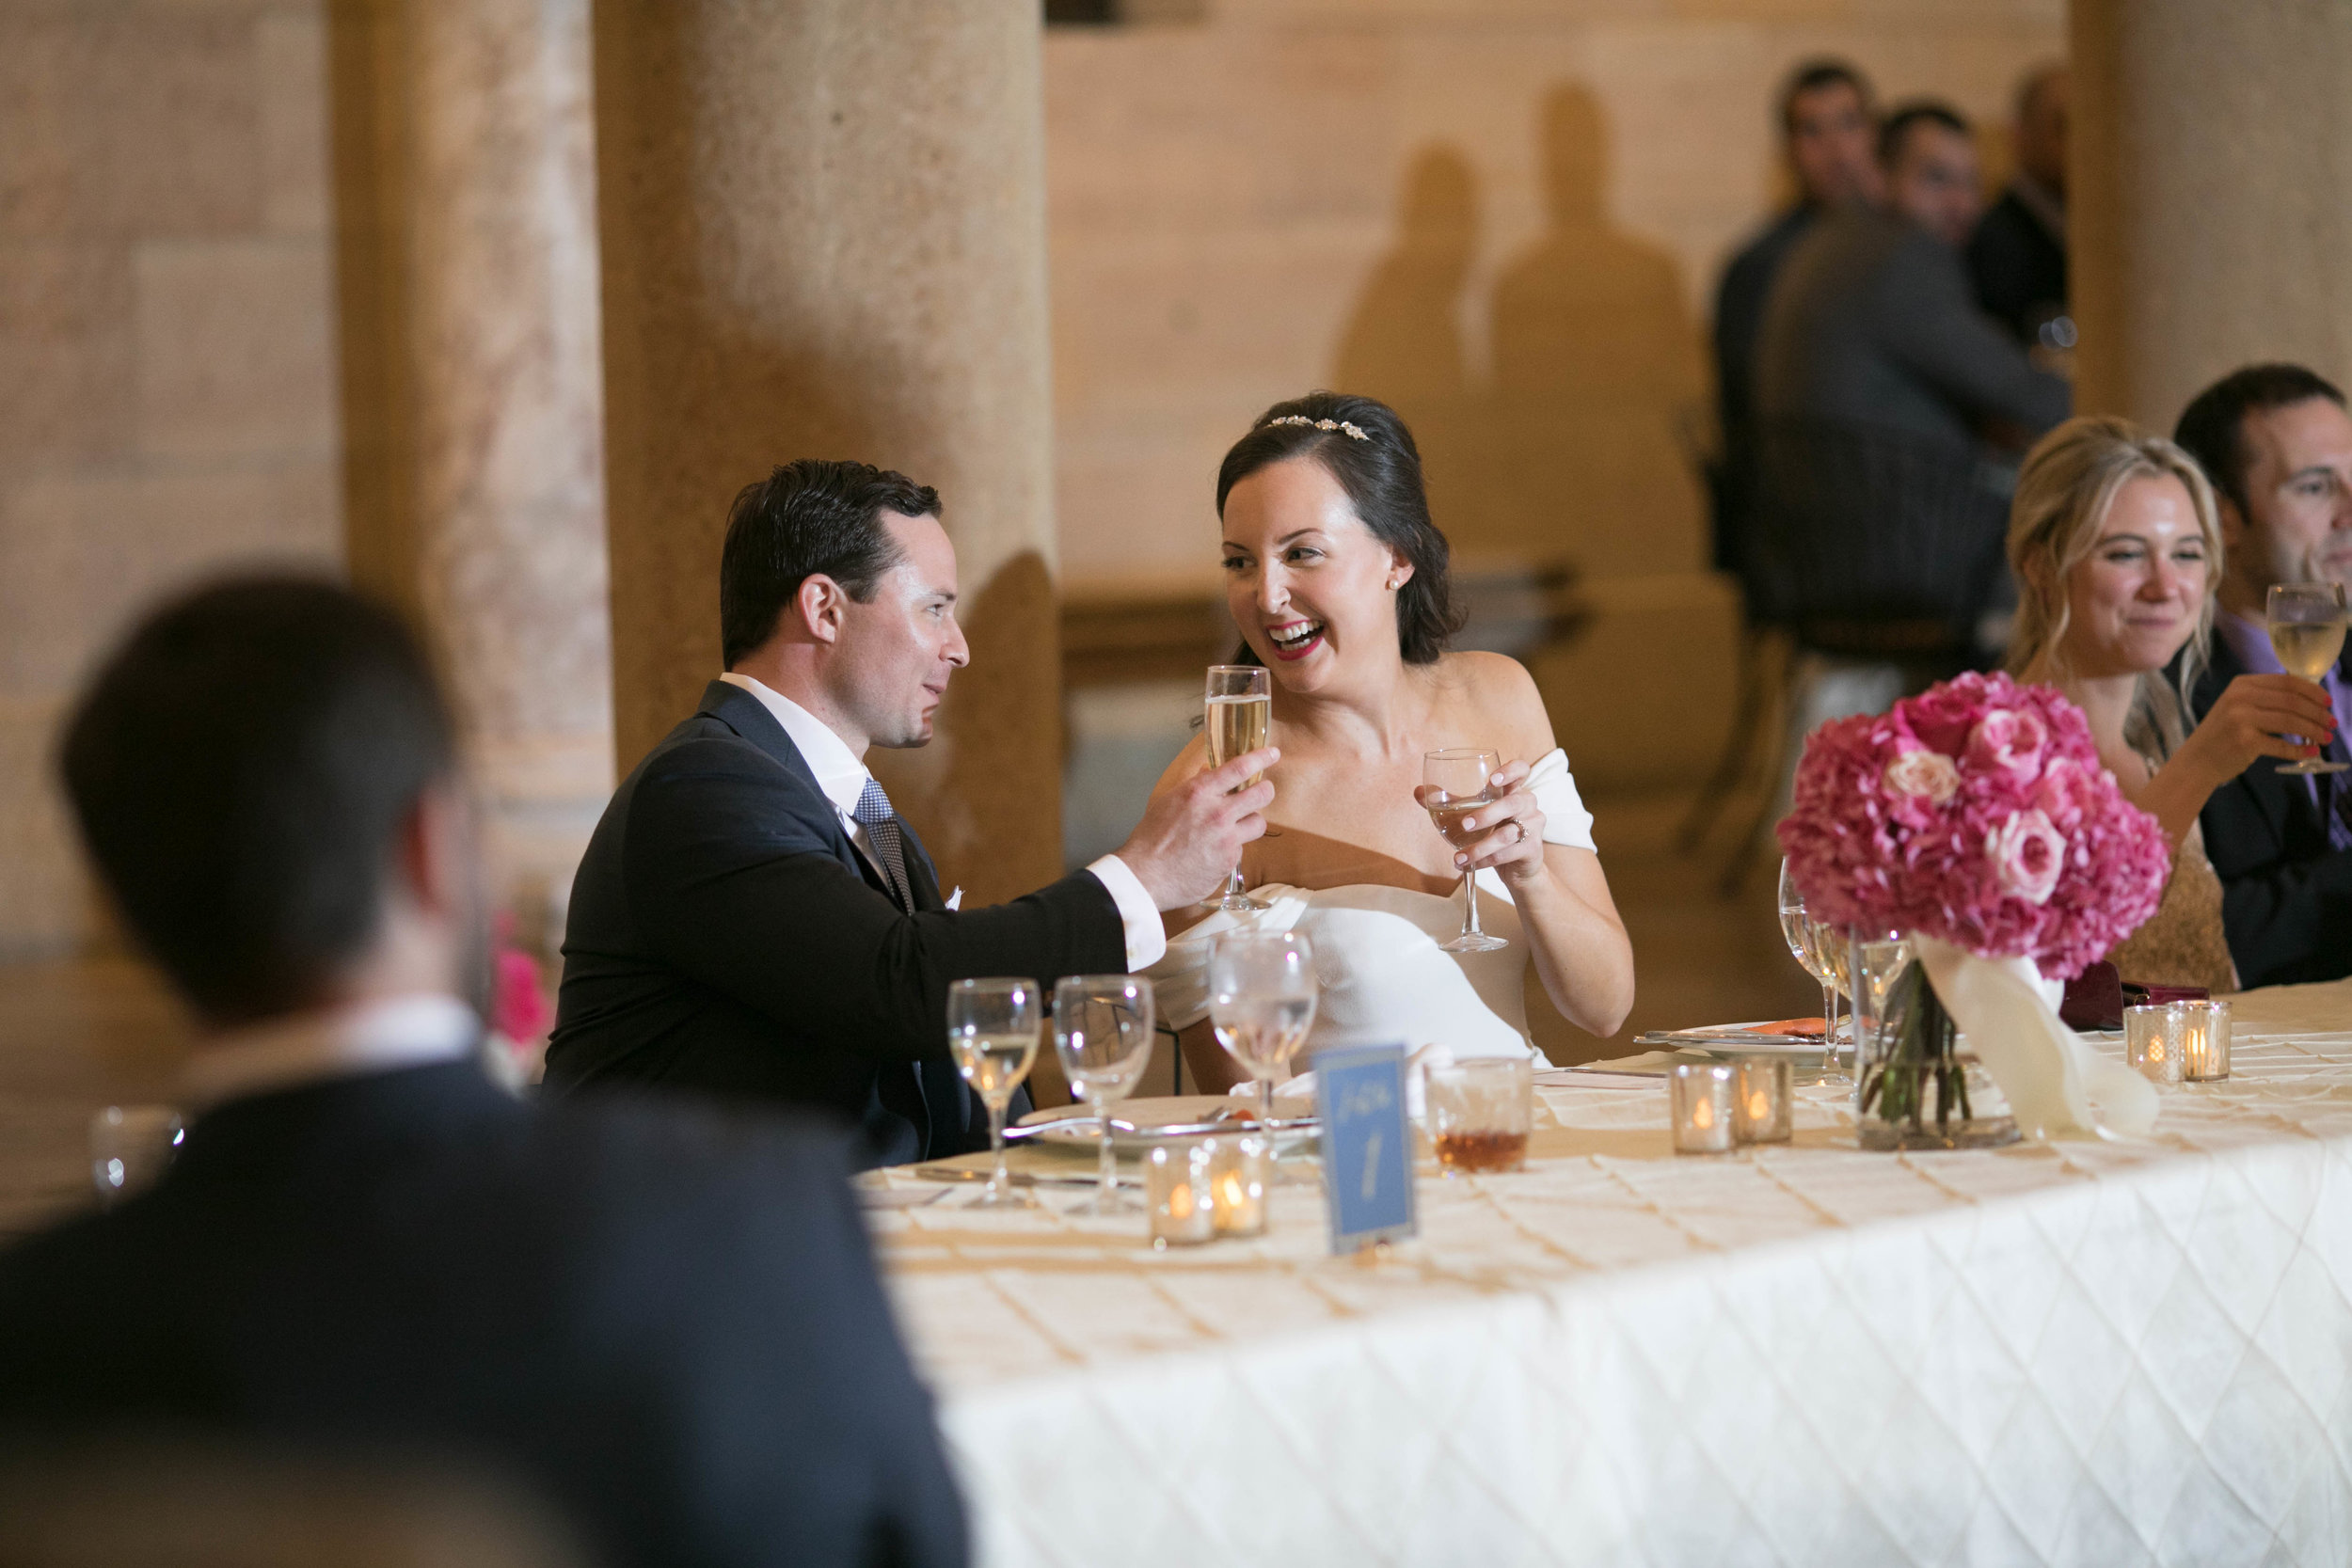 nelson-atkins-wedding-73.jpg